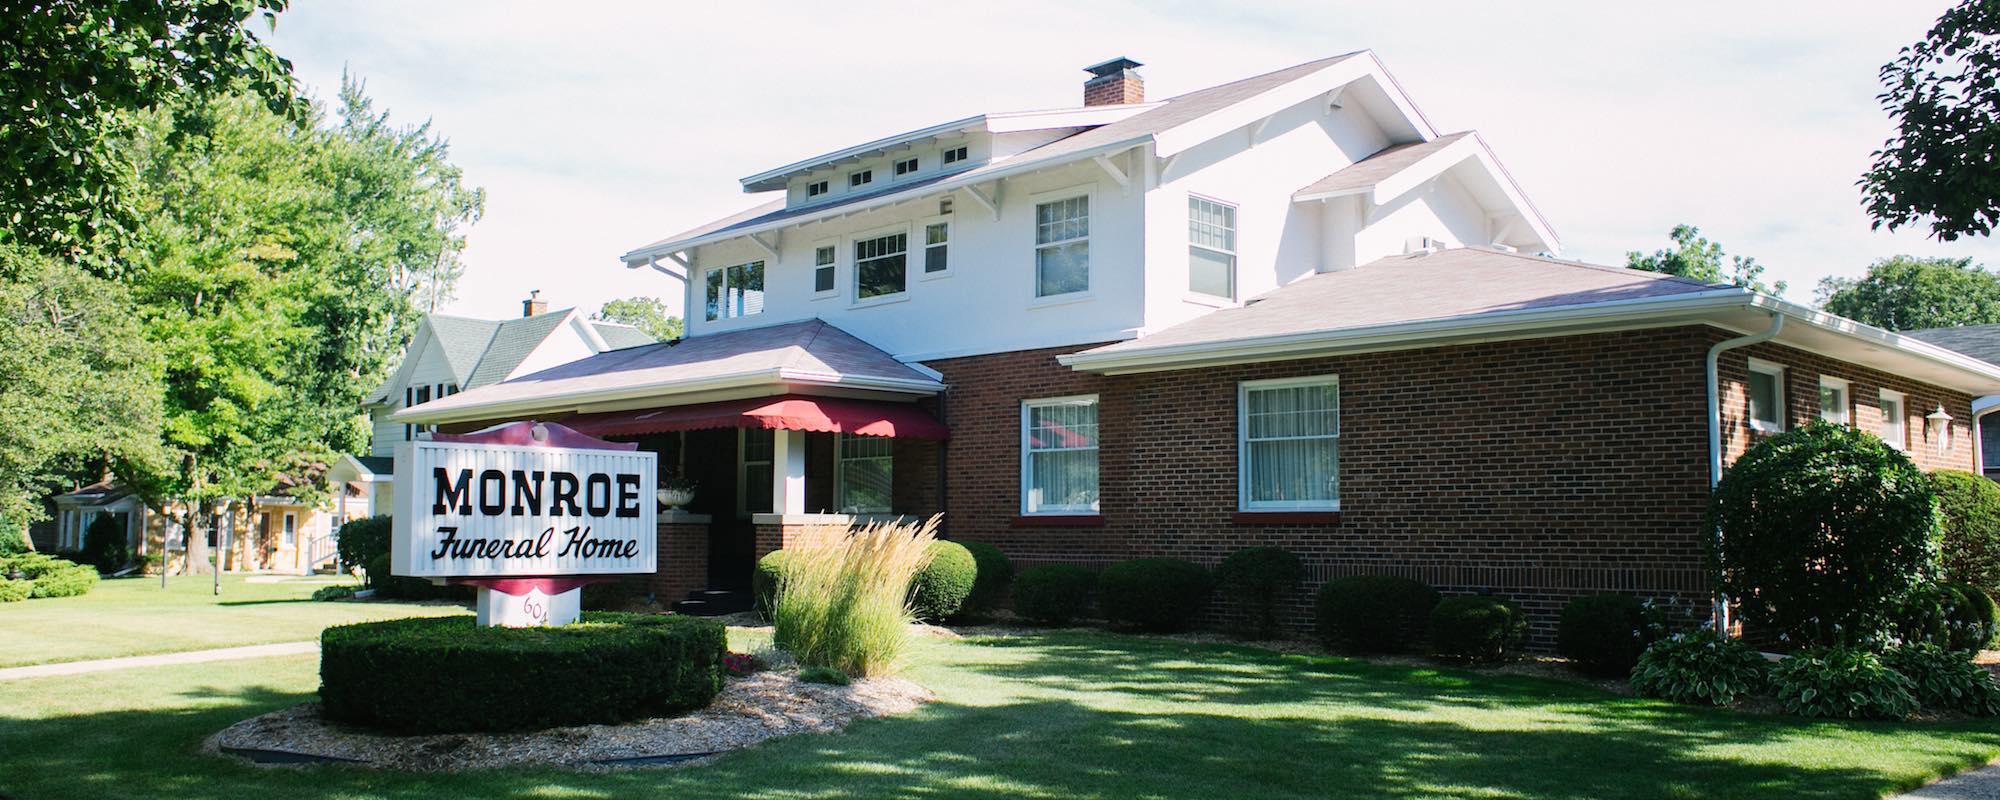 Monroe Funeral Home